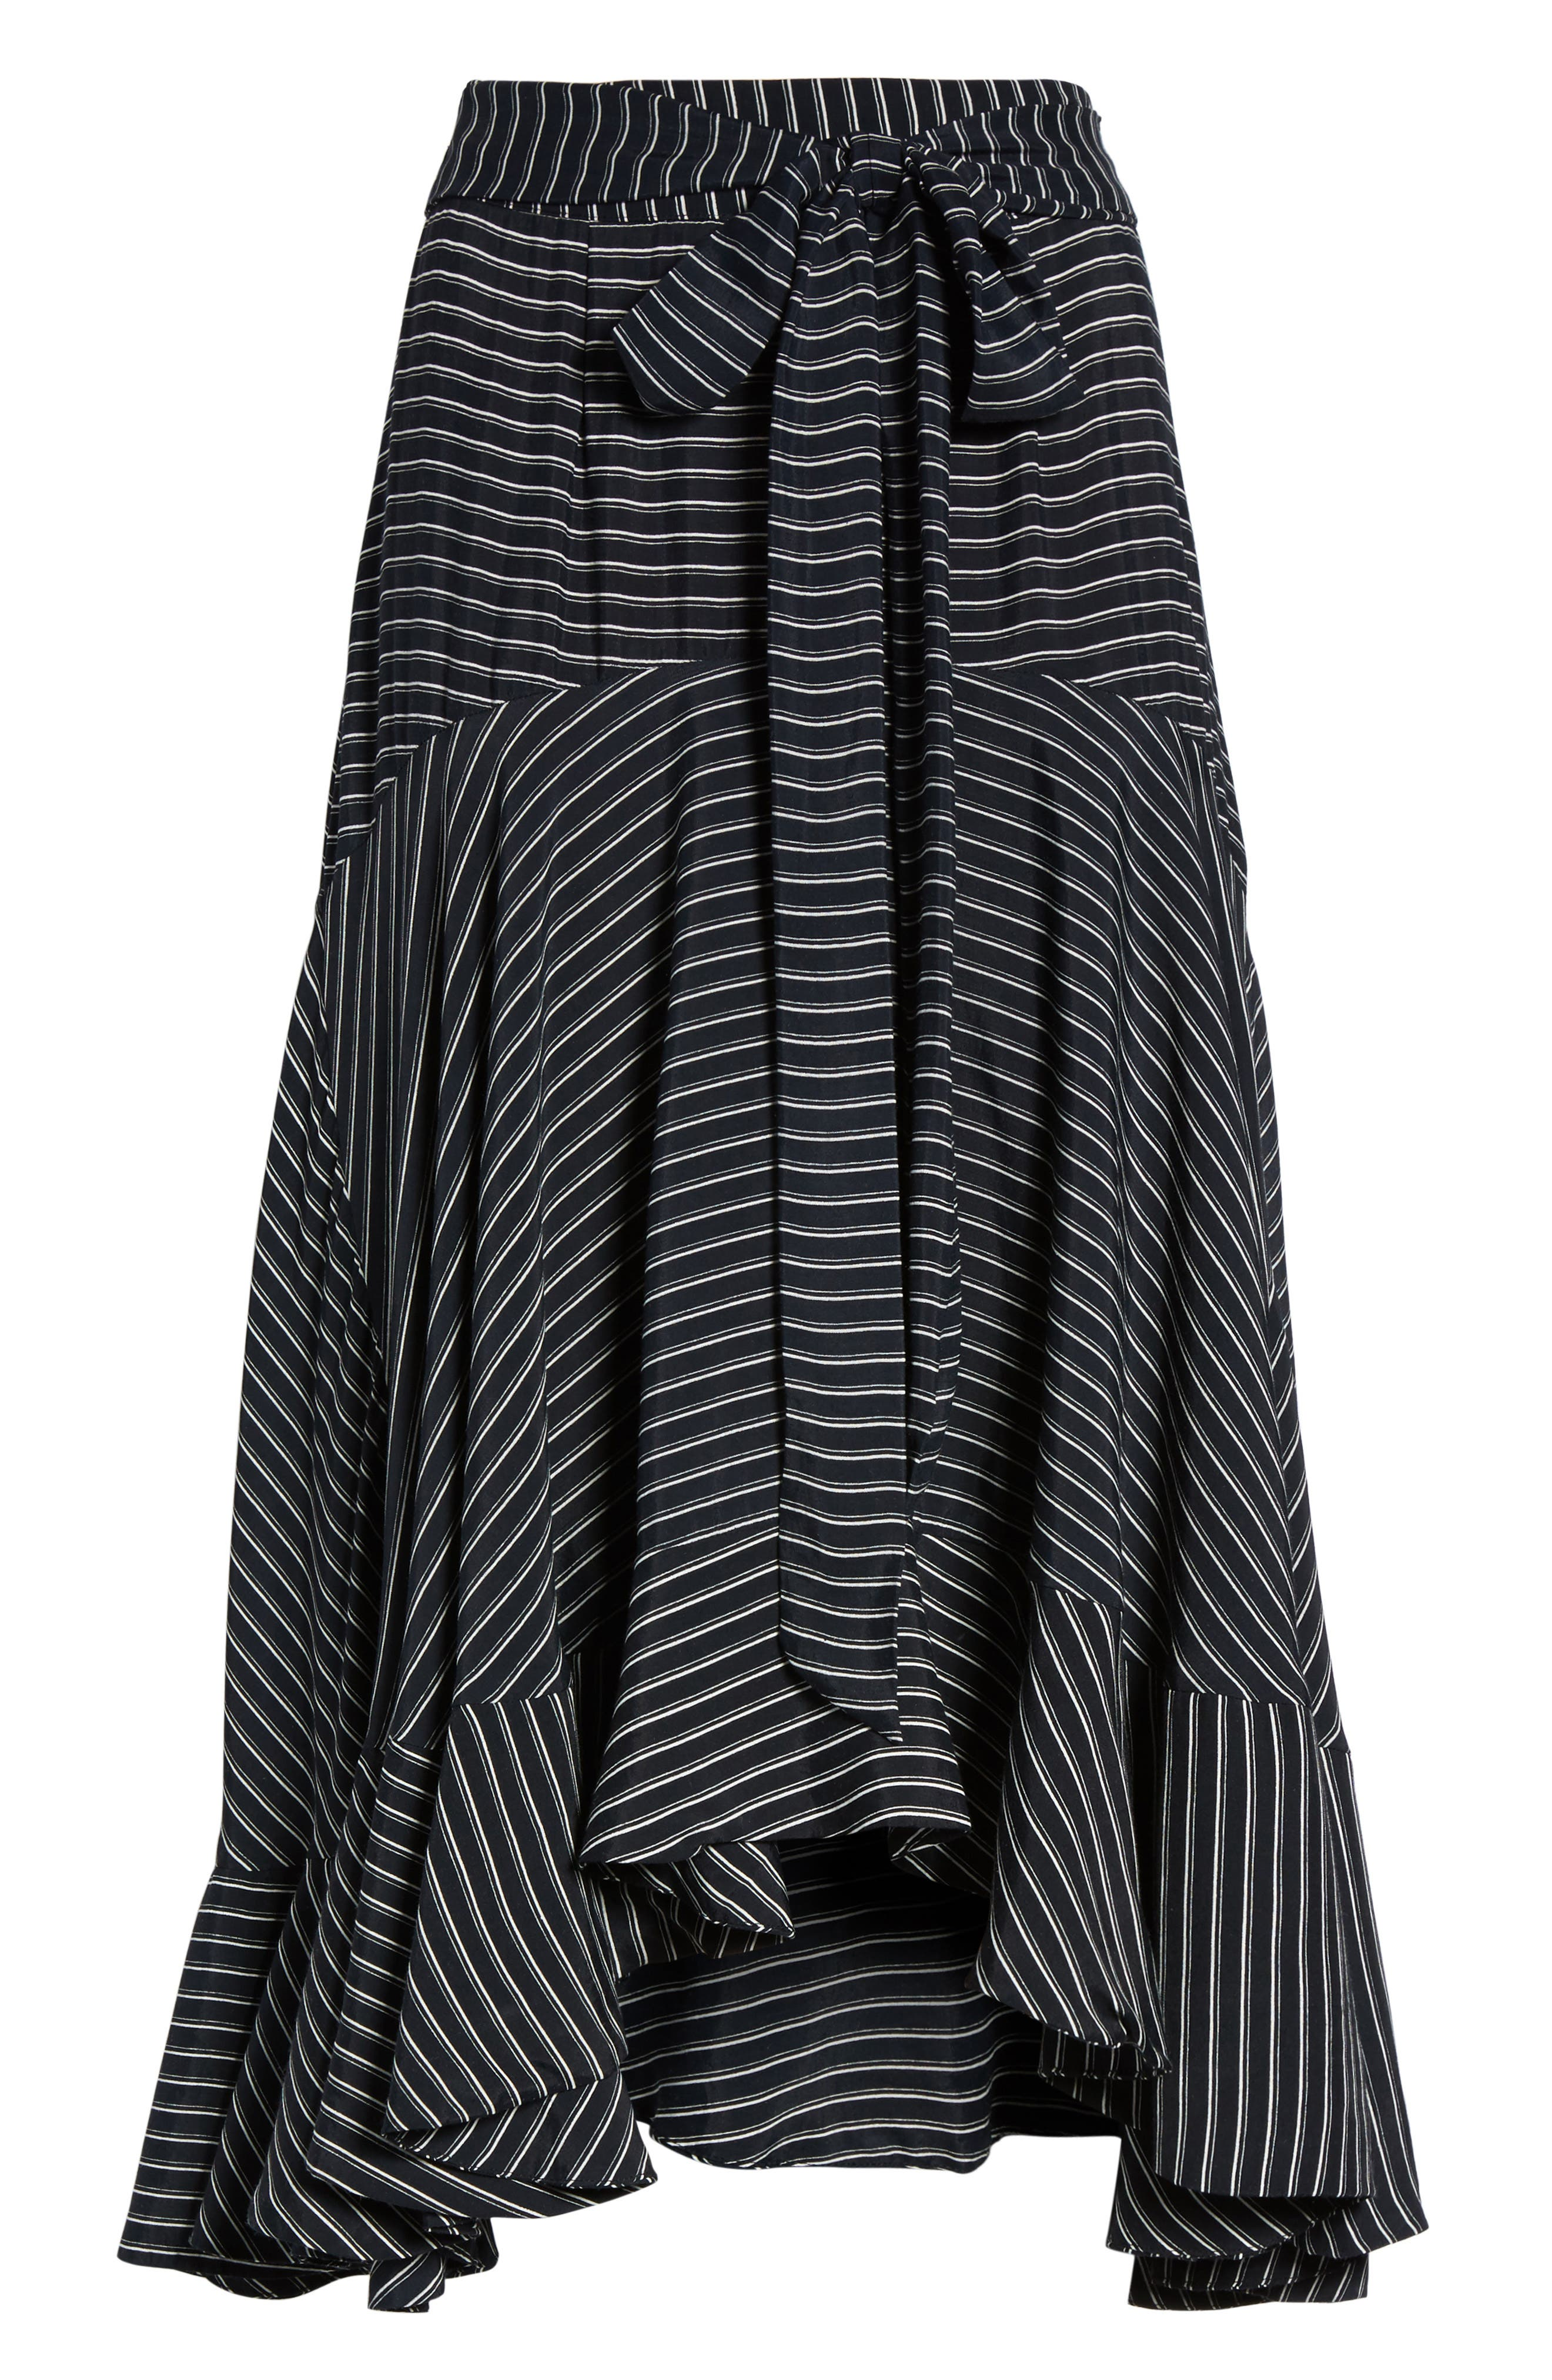 Kamares Ruffle Midi Skirt,                             Alternate thumbnail 6, color,                             001